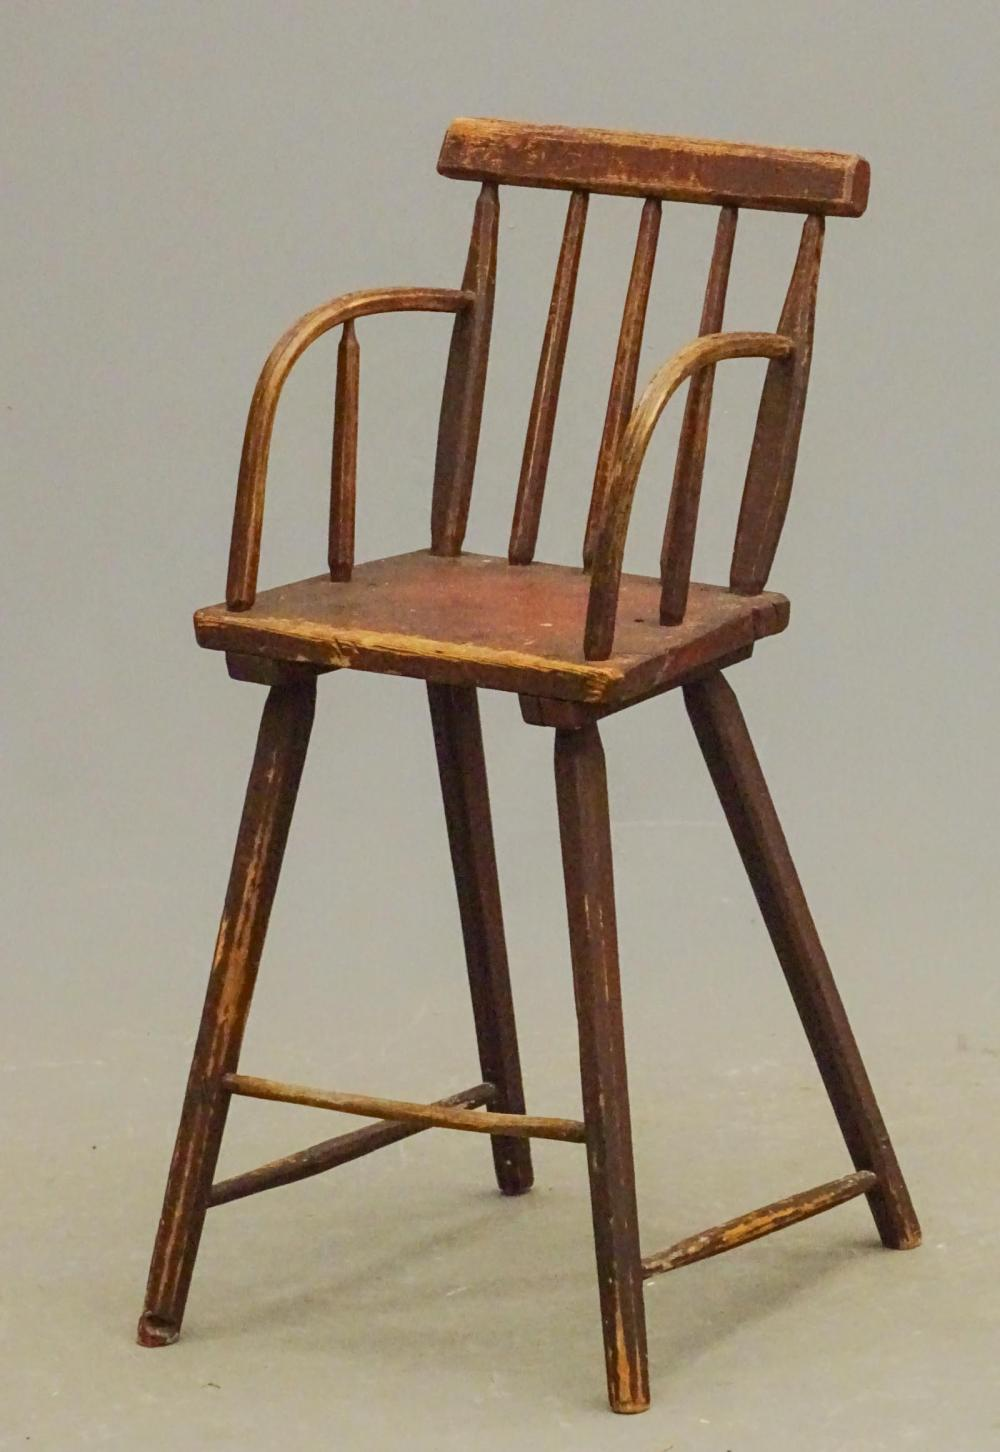 18th c. Highchair